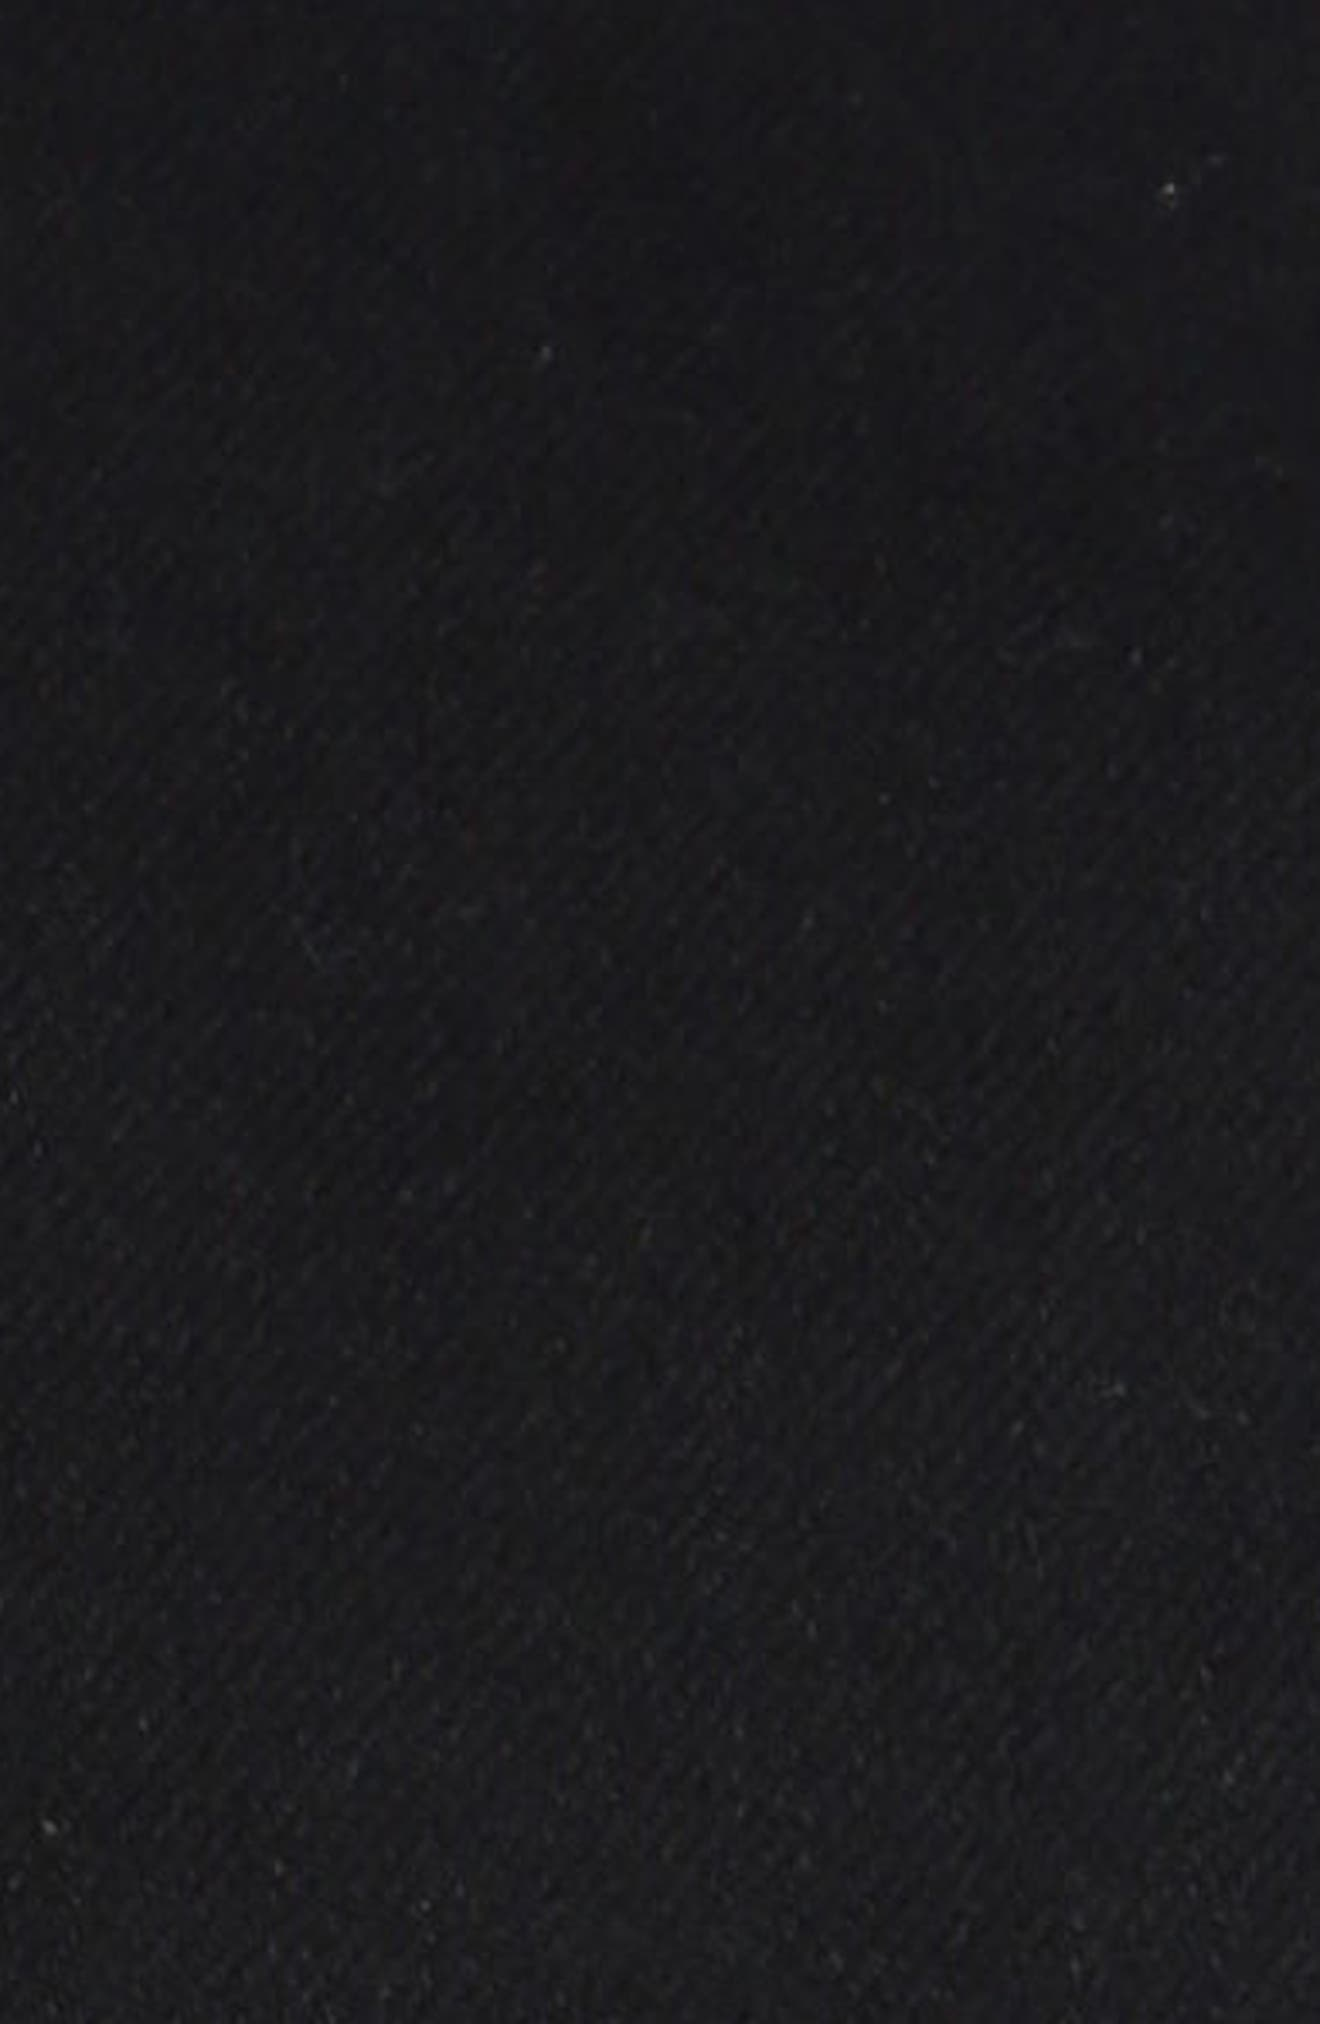 Frank Denim Jacket,                             Alternate thumbnail 3, color,                             Black Comfort